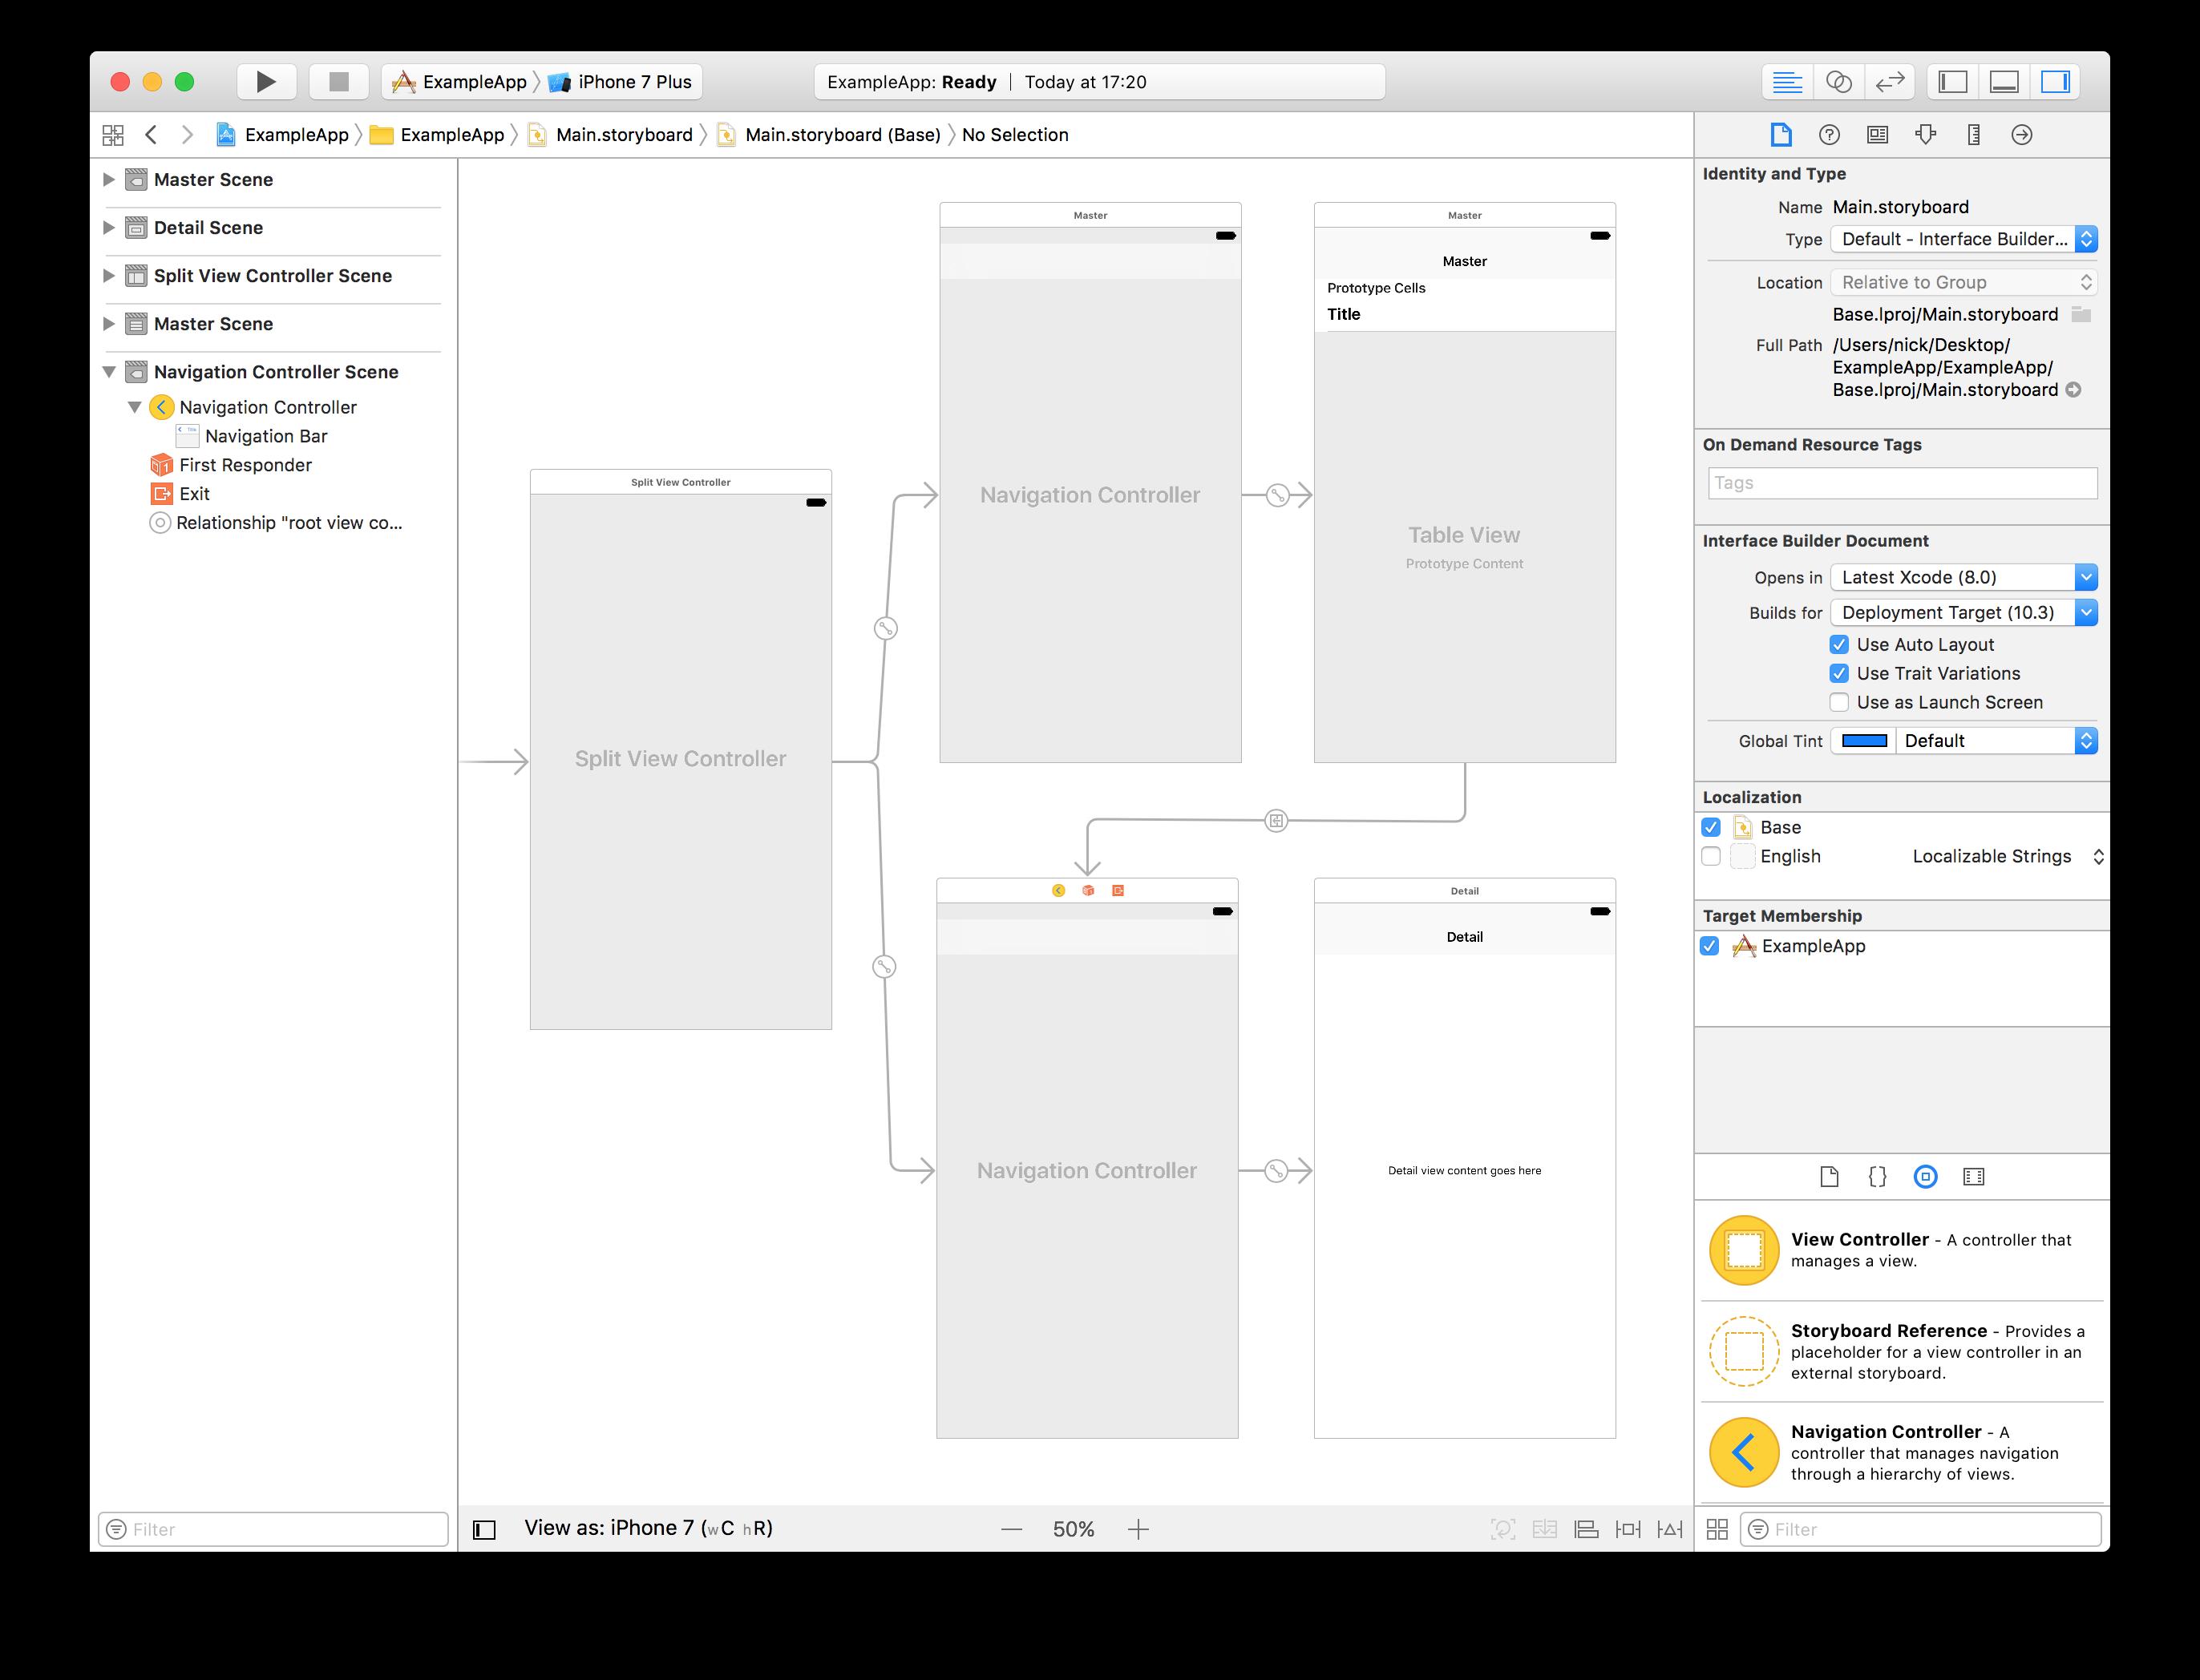 Apple's Interface Builder